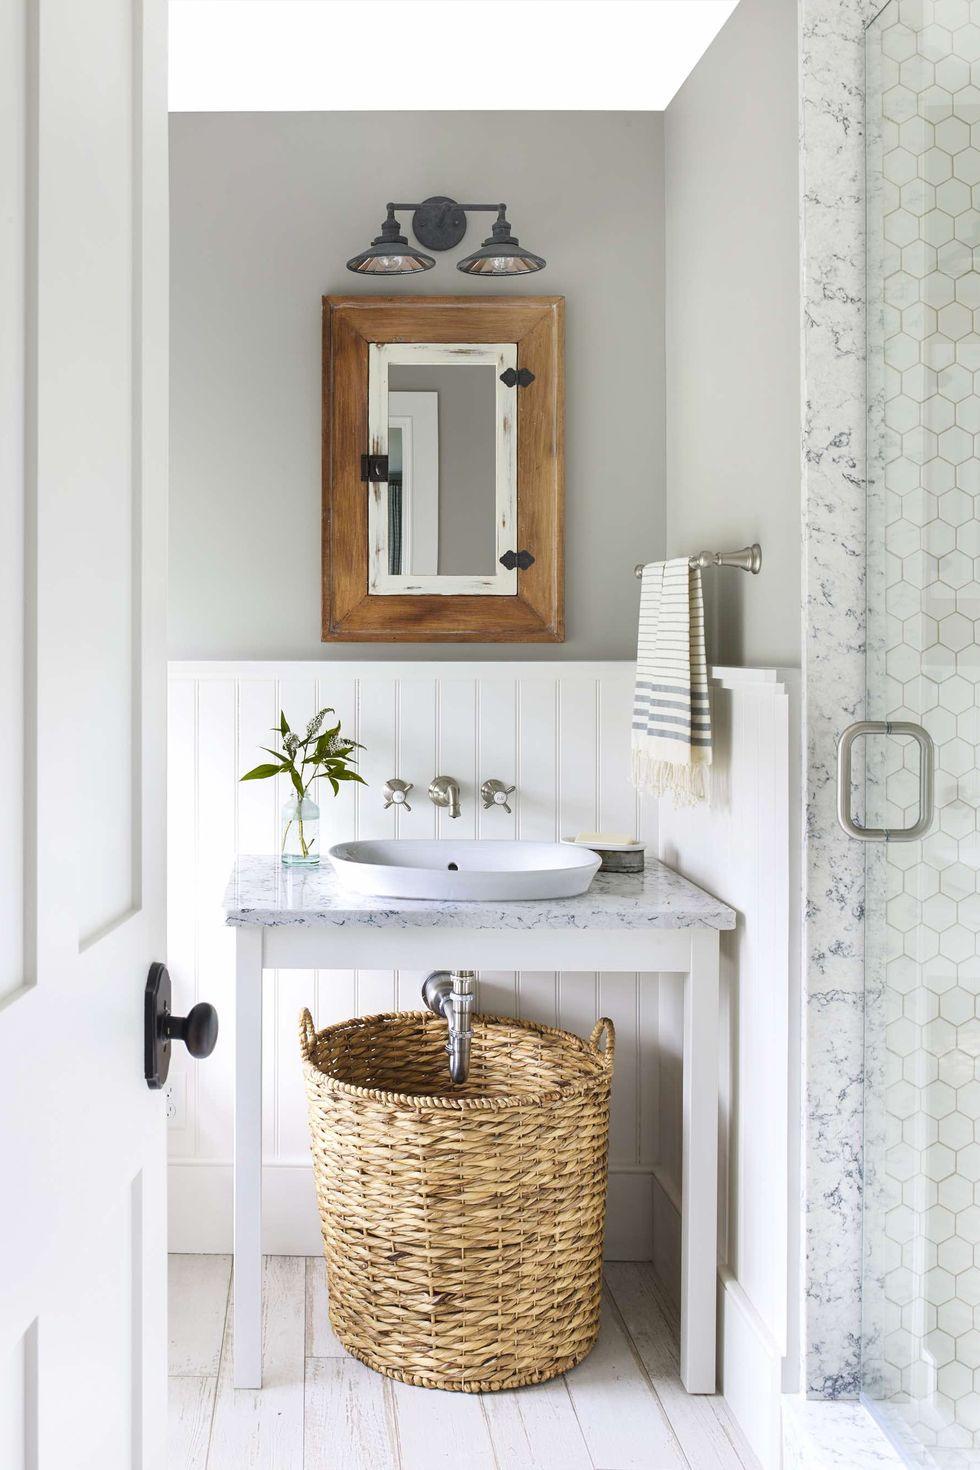 Quartz can look beautiful in the bathroom. Source: Good Housekeeping